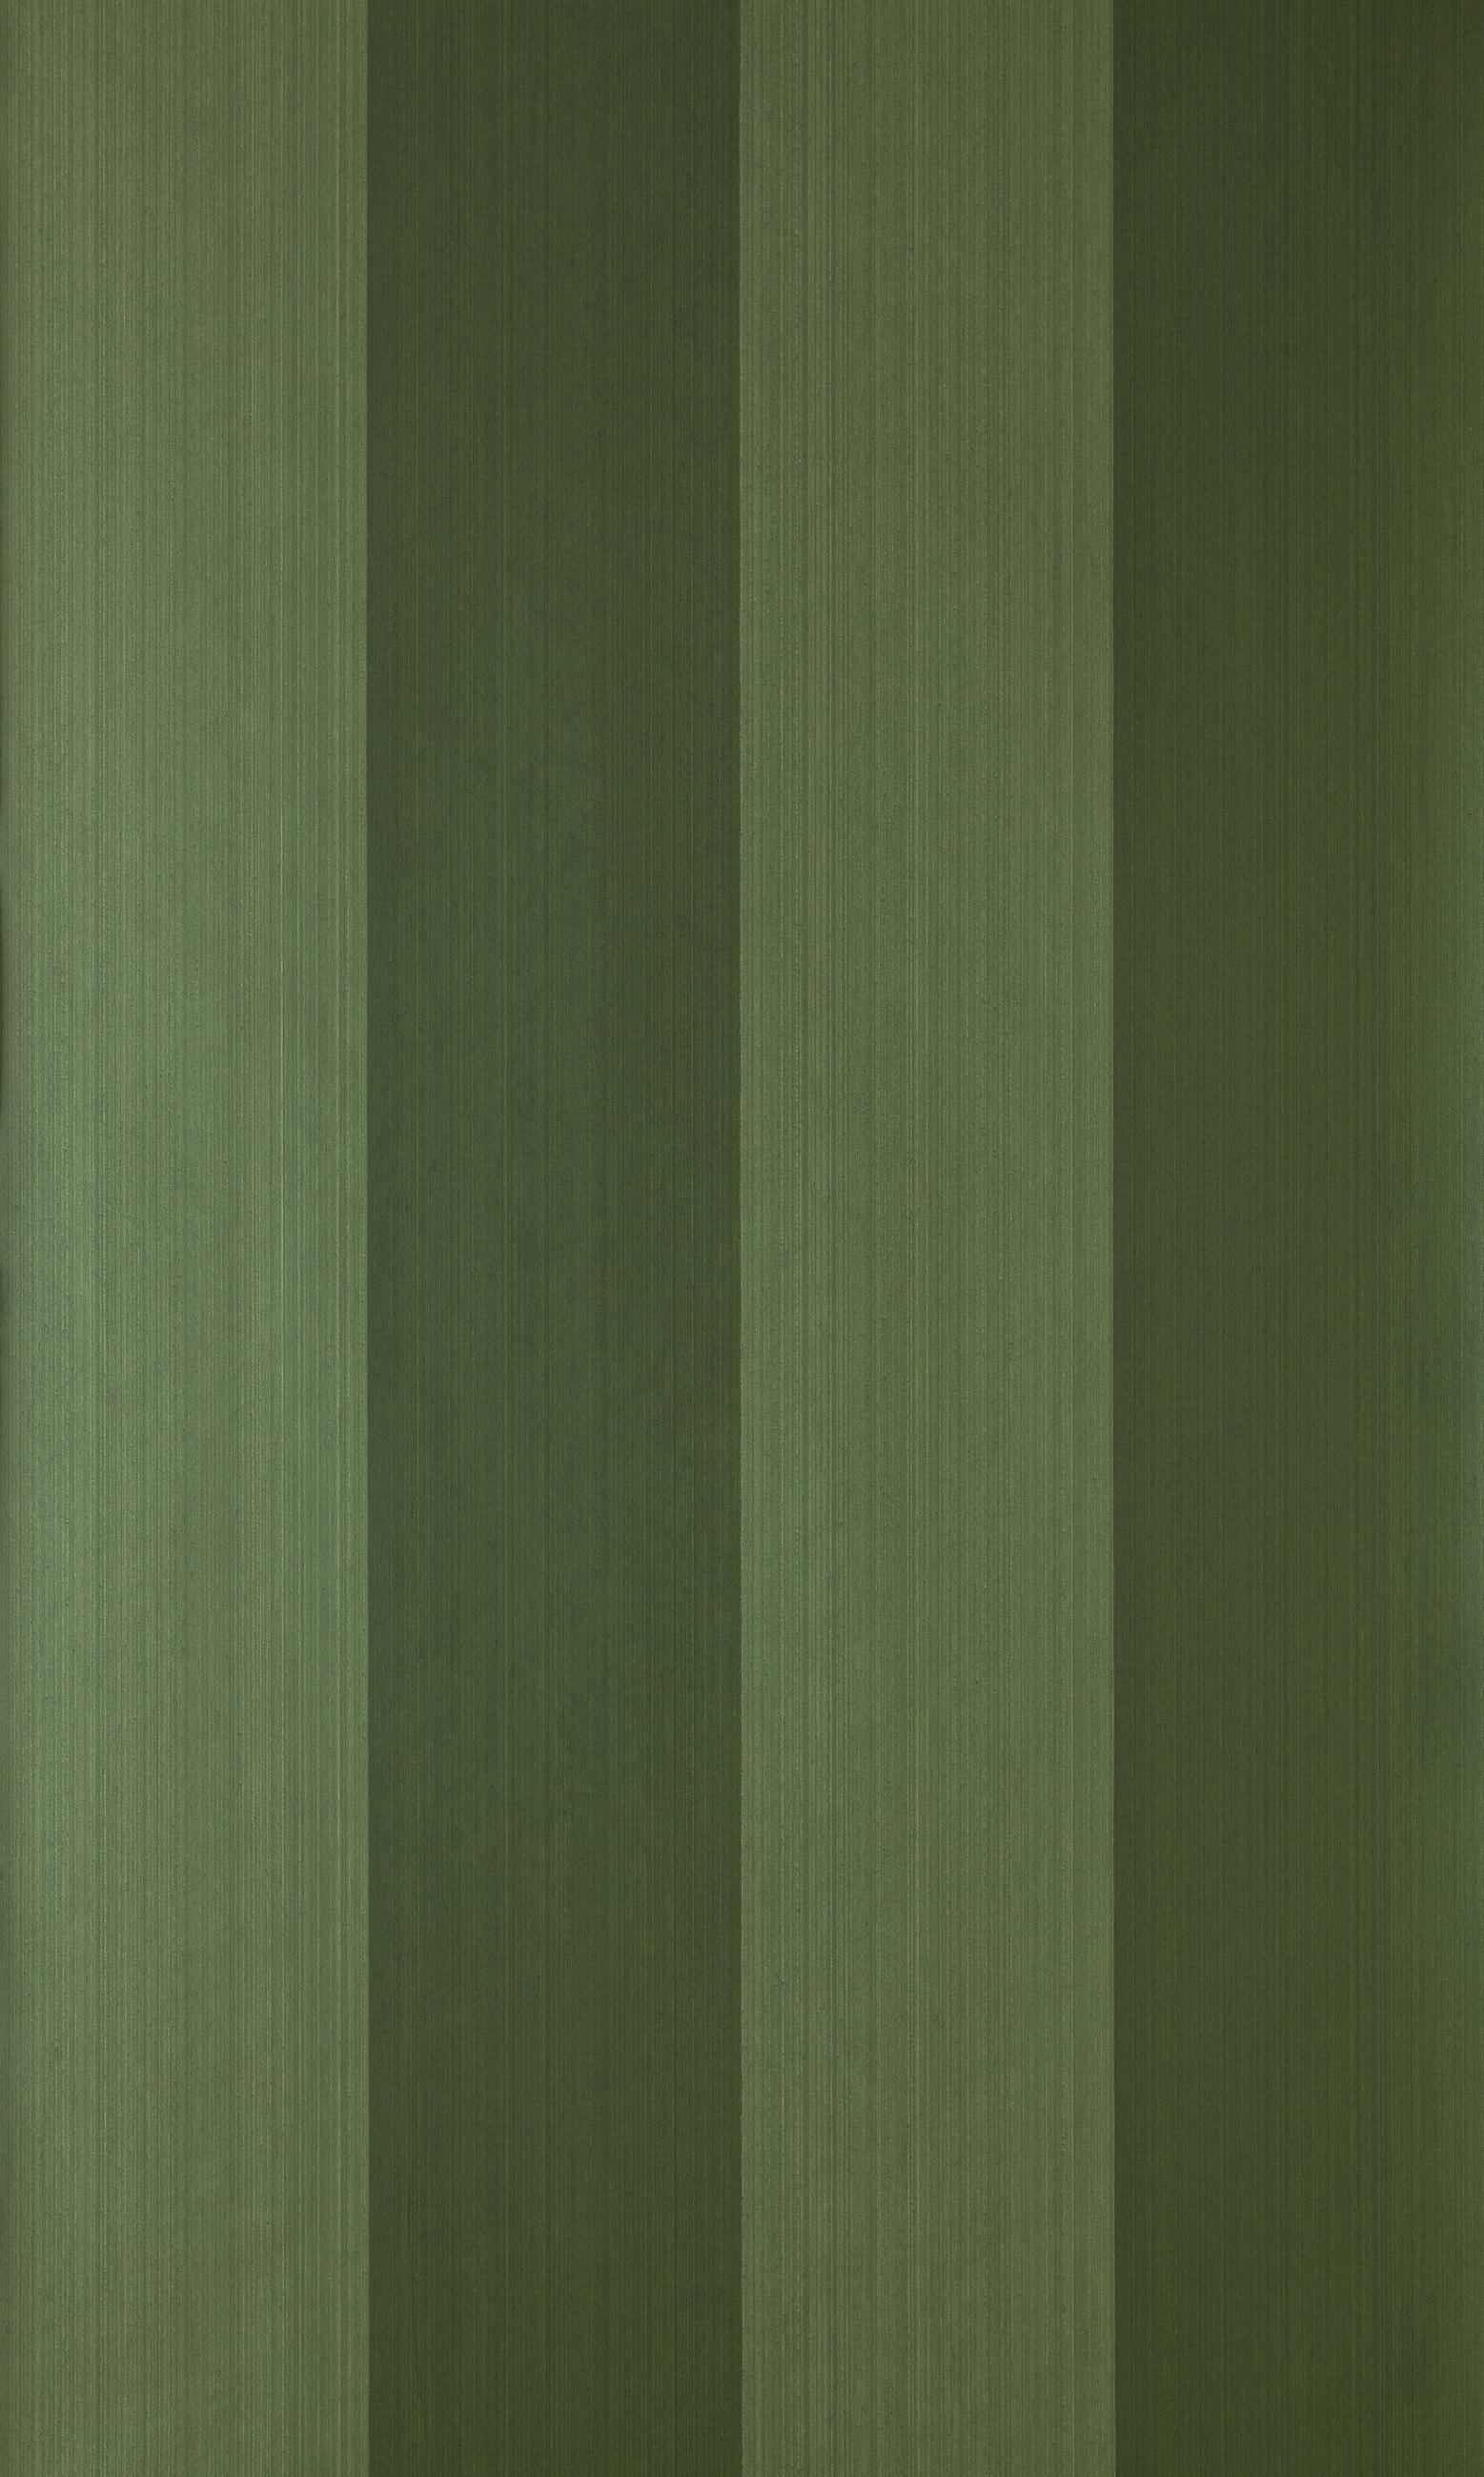 Broad Stripe 1329 $195 Per Roll  Order Now